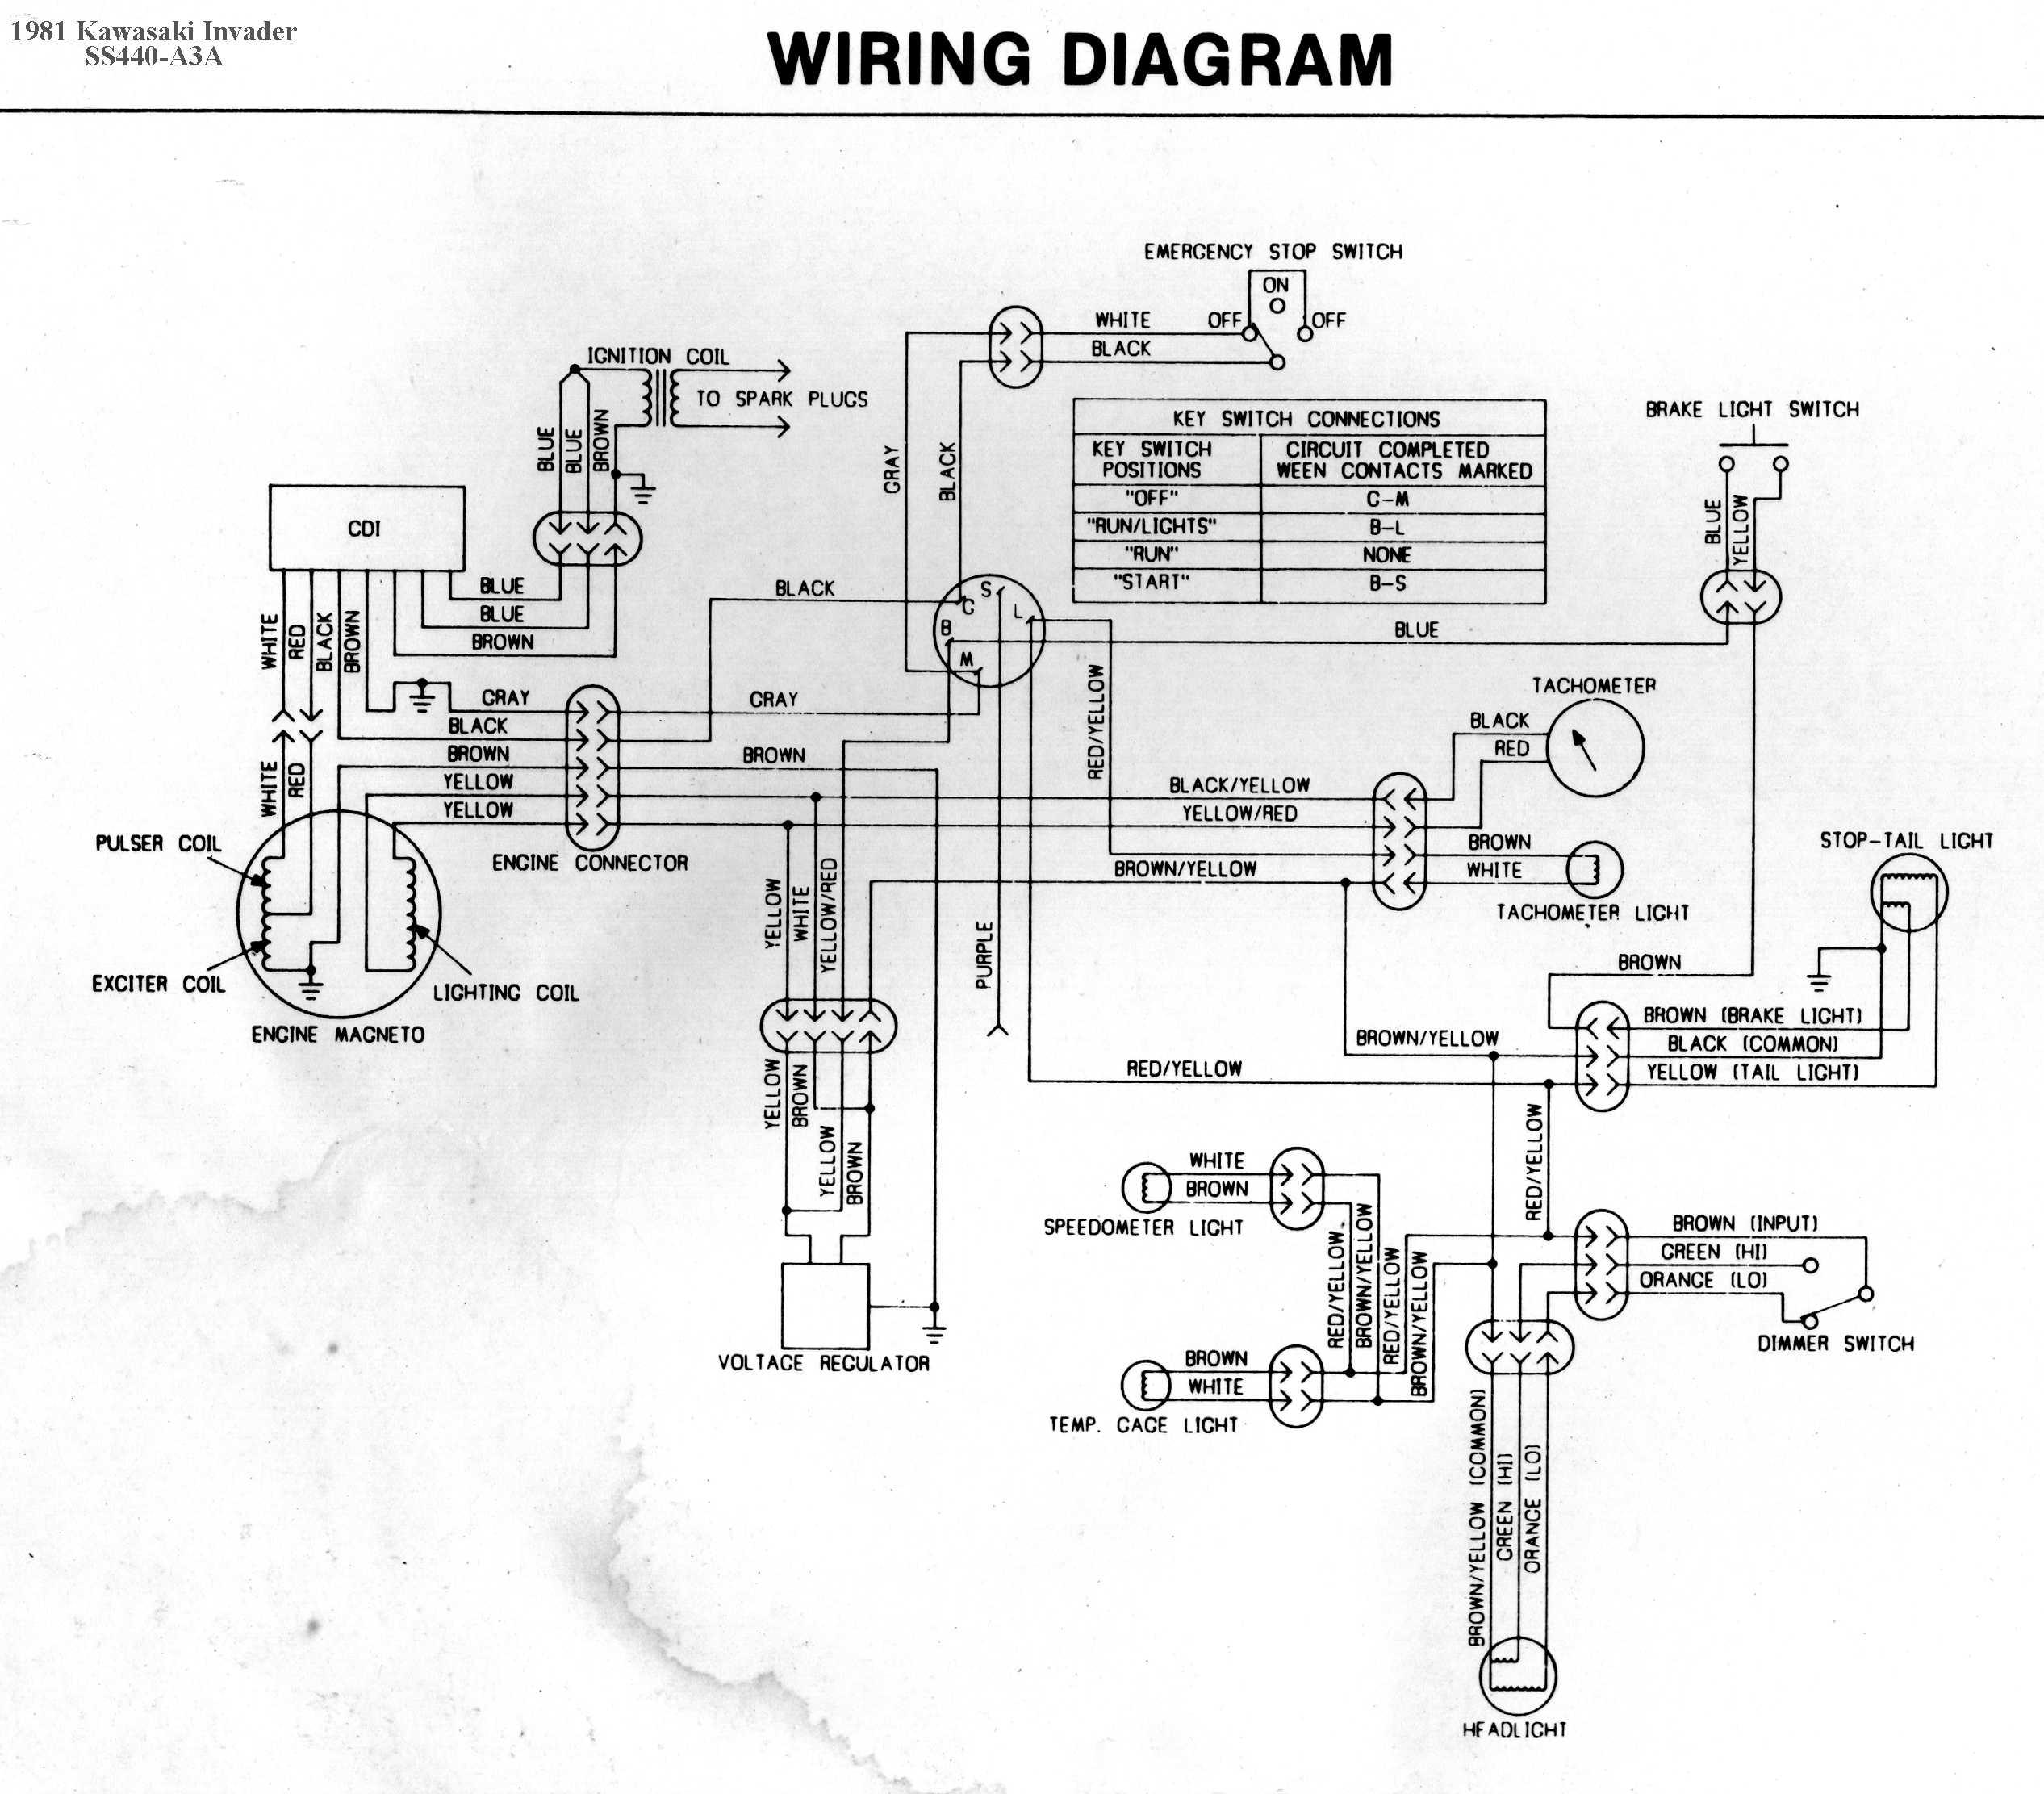 Remarkable 1992 Polaris Wire Diagram Wiring Schematic Basic Electronics Wiring Cloud Monangrecoveryedborg